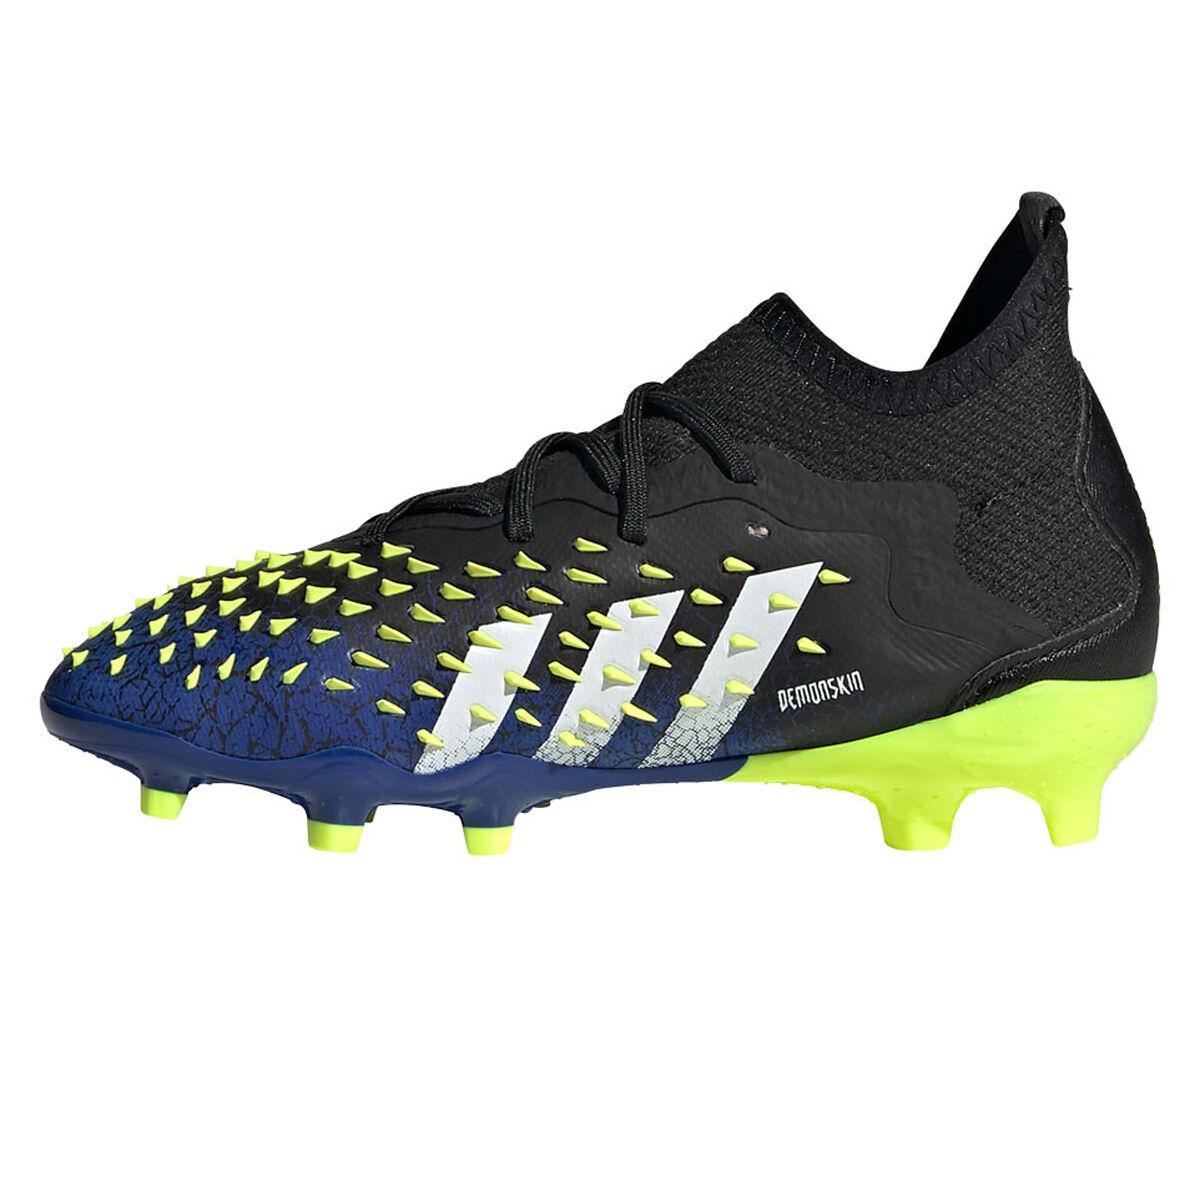 adidas afterburner 4 boys black boots size 13   adidas Predator Freak .1 Kids Football Boots